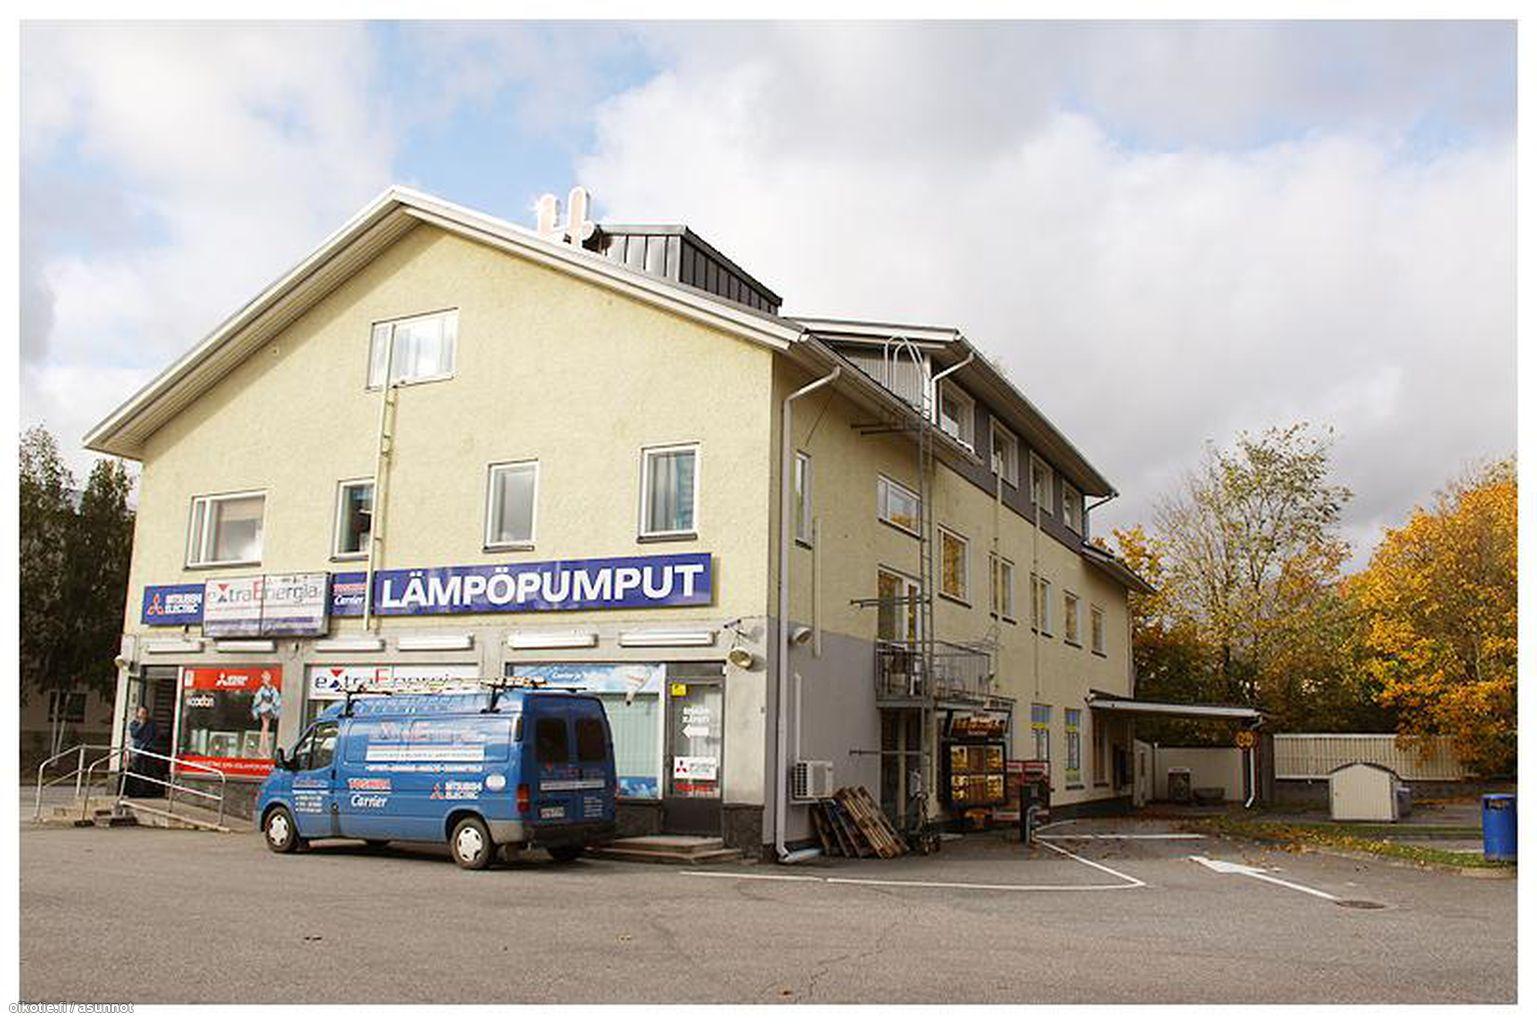 Tampereen Valtatie